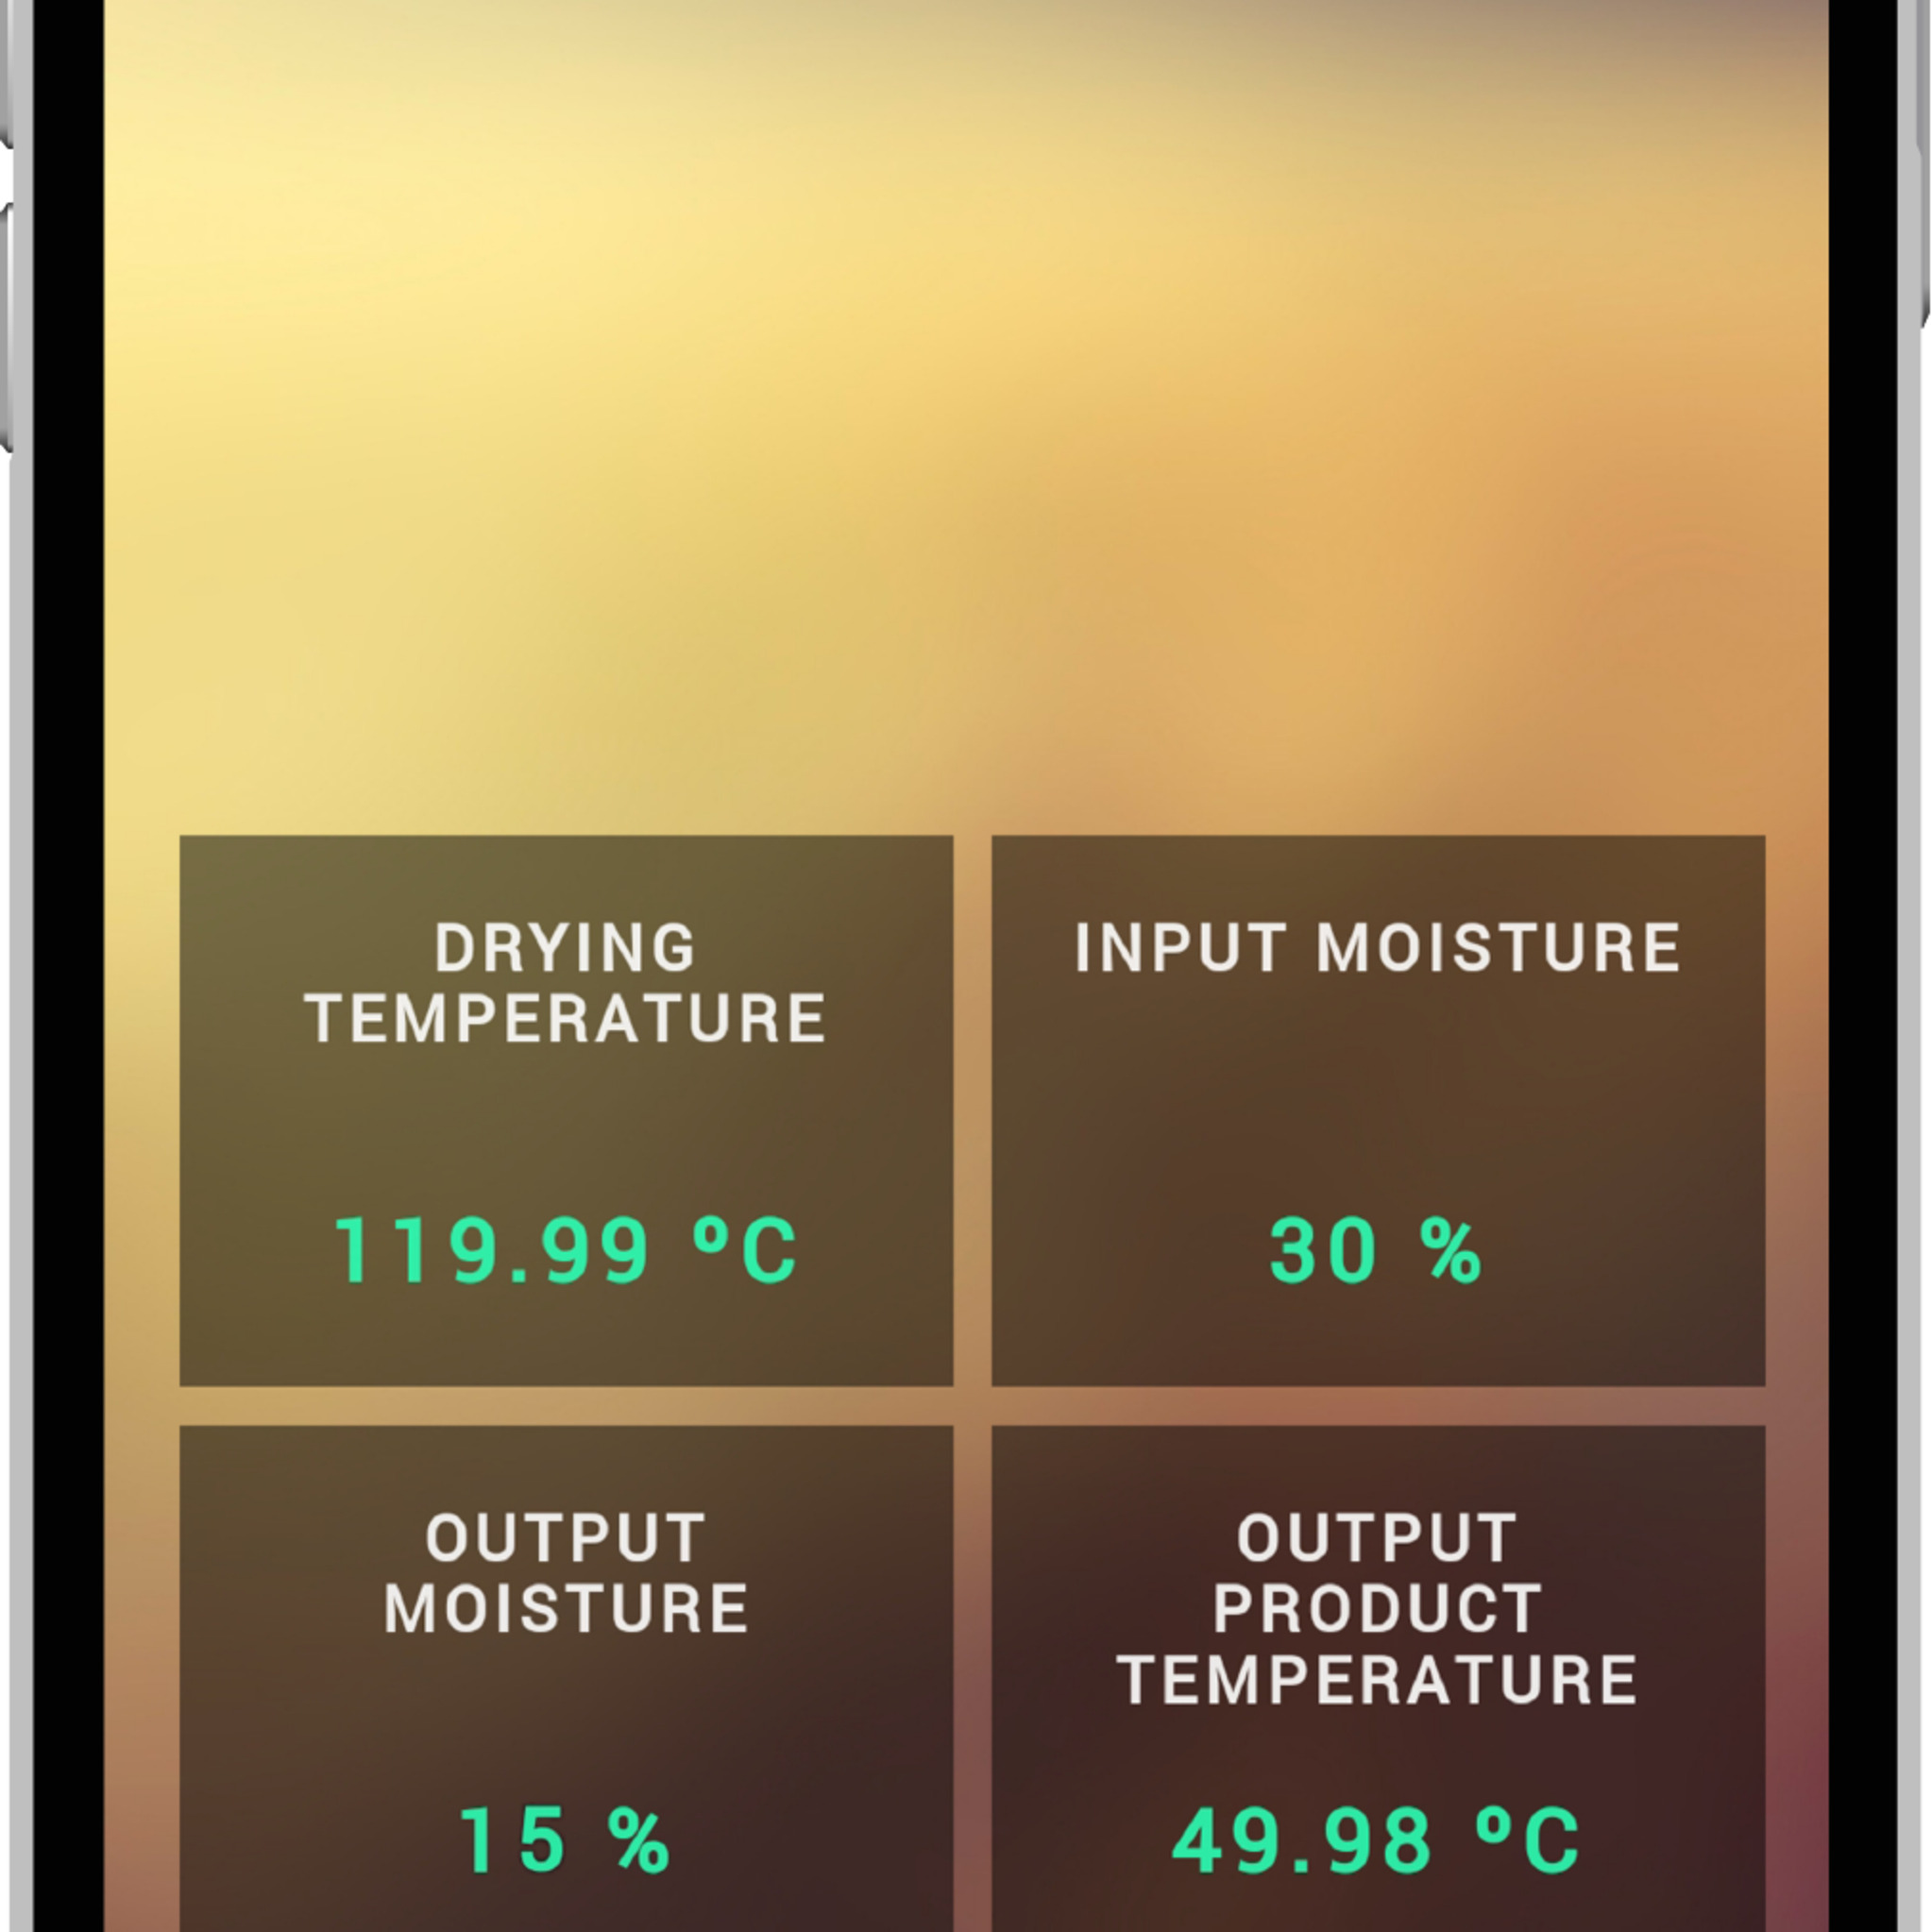 DryMate Moisture Control